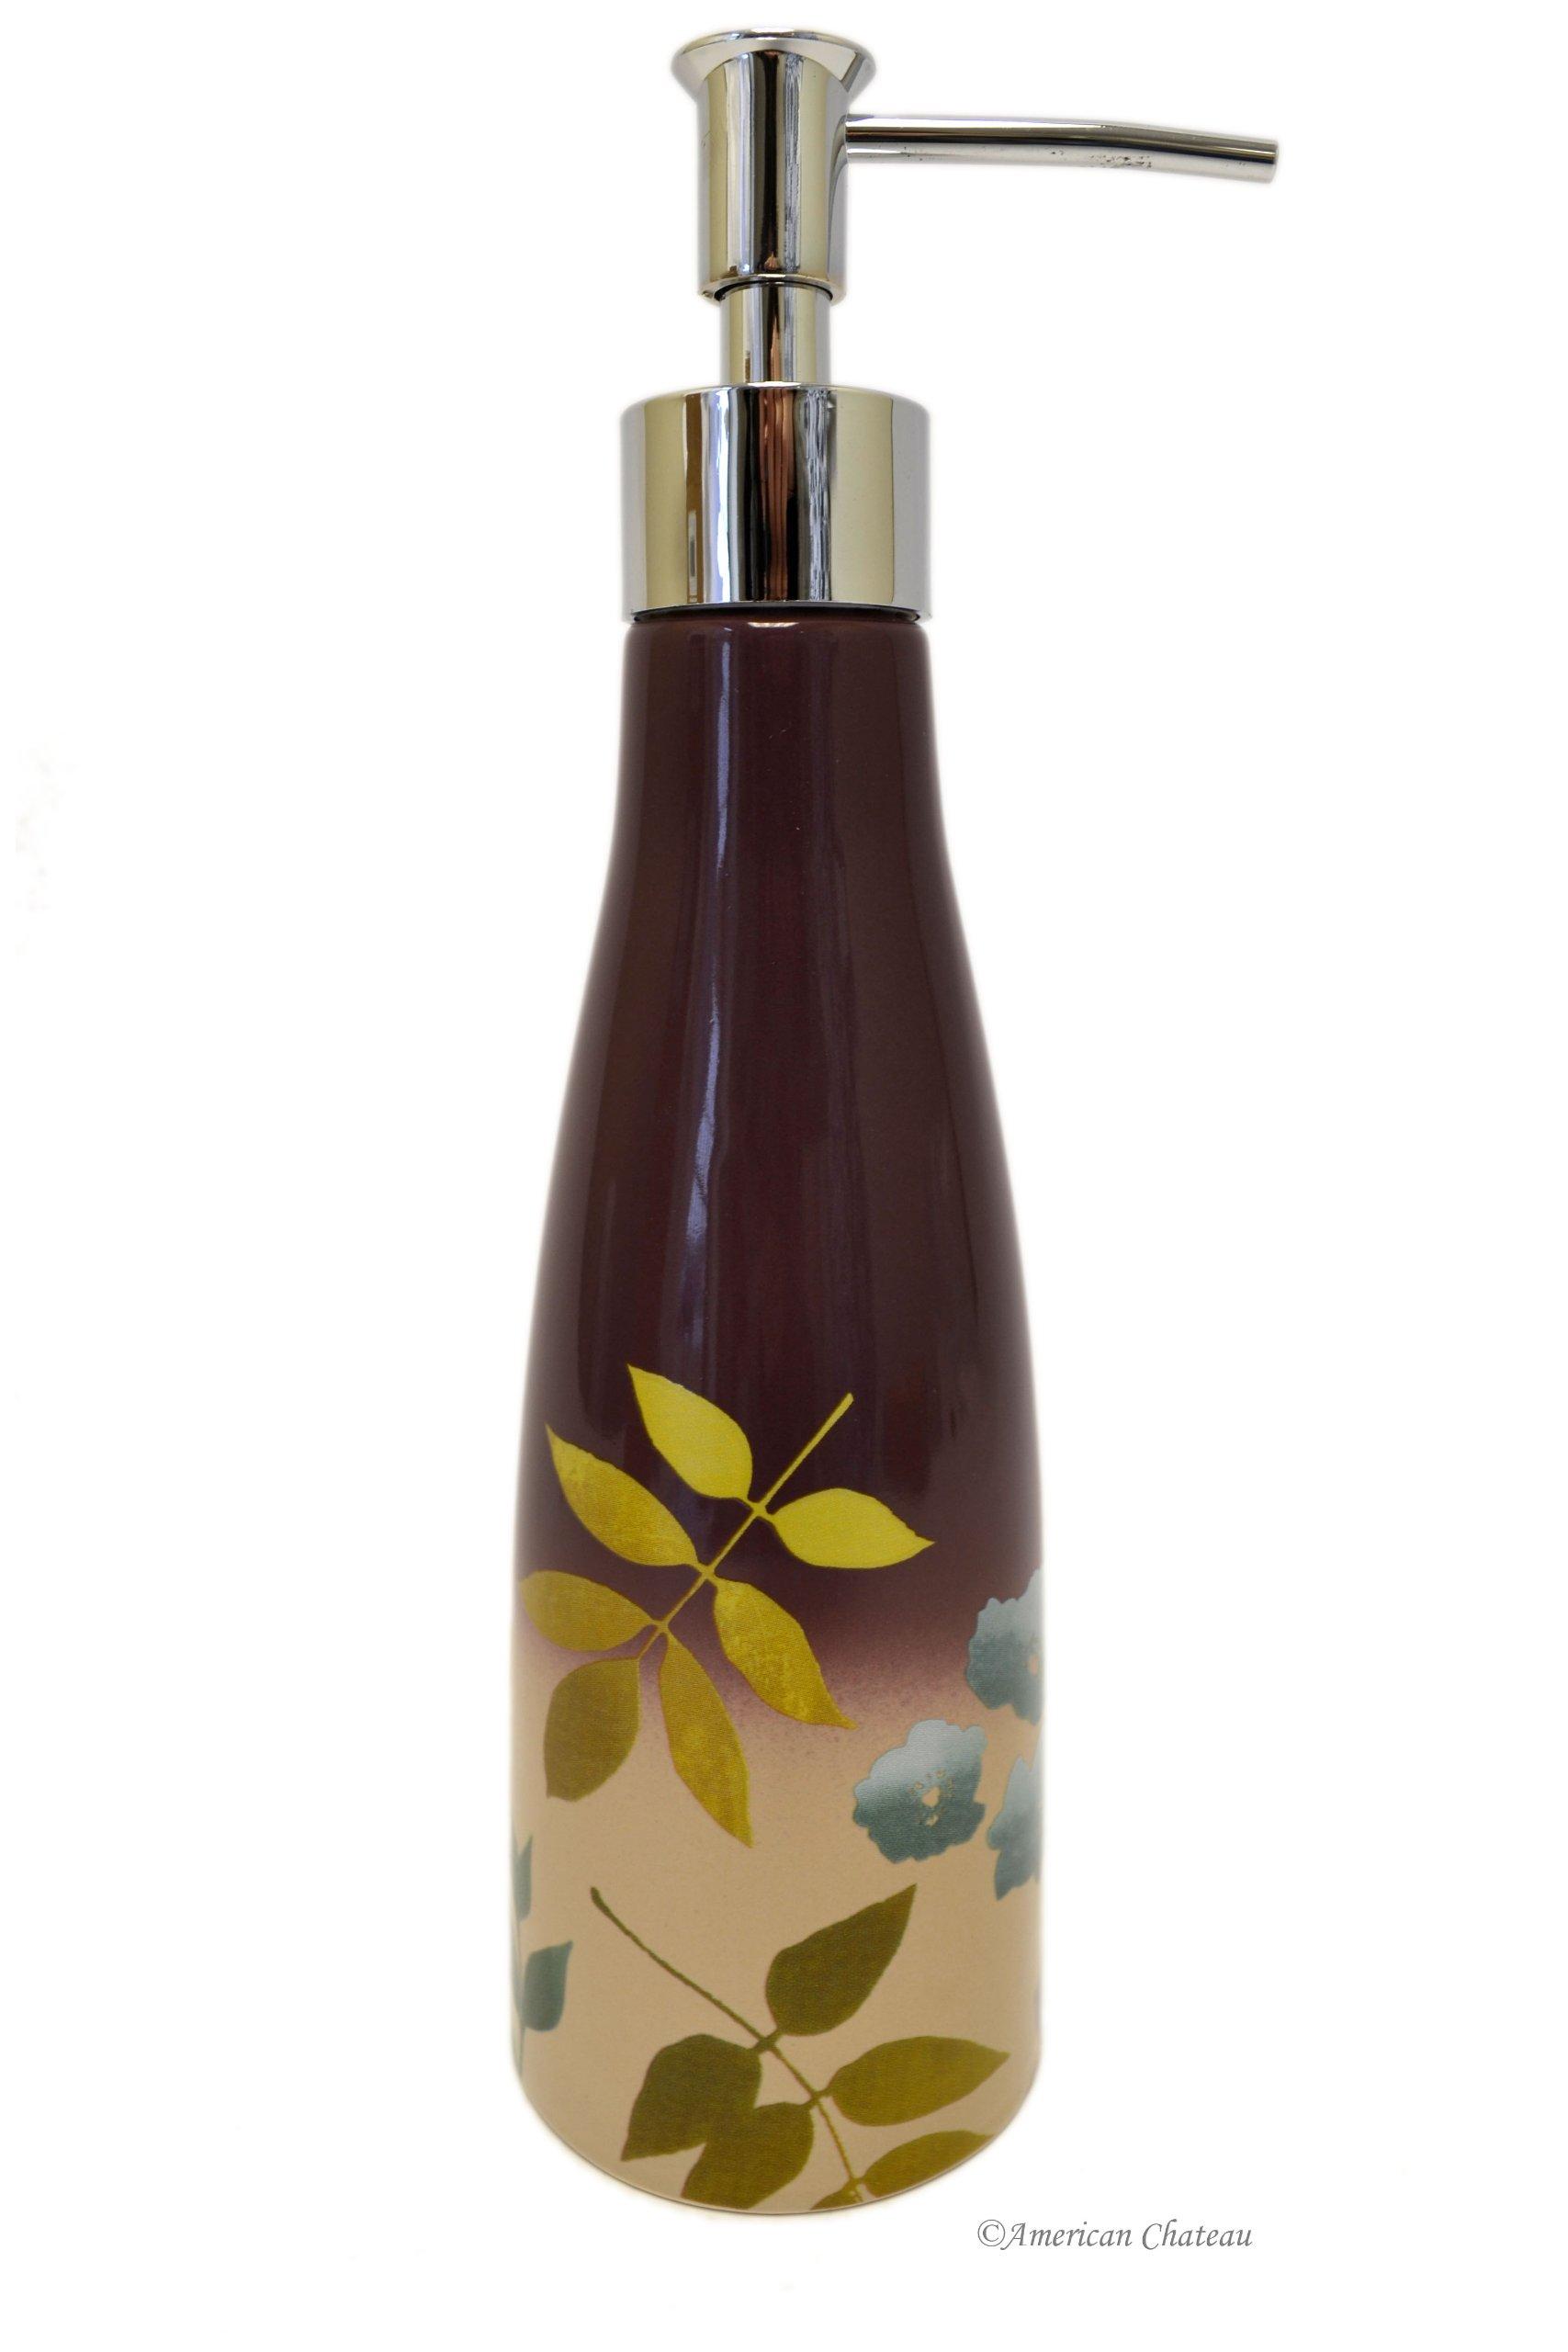 American Chateau Purple Flower & Leaves Ceramic Bathroom Sink Bath Soap Lotion Dispenser Pump